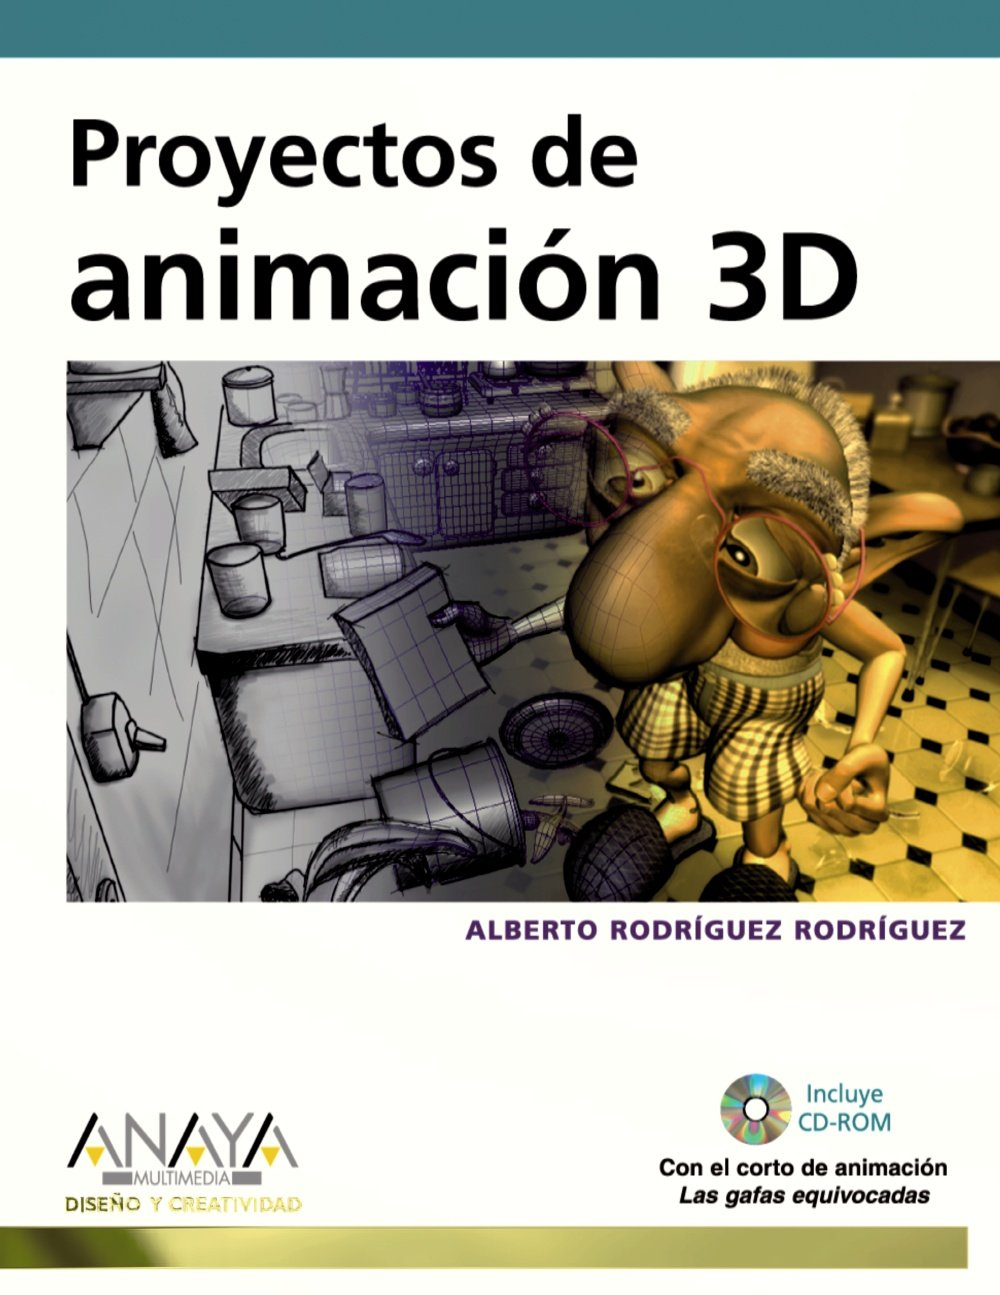 Proyectos de animacion 3D / 3D Animation Projects (Spanish Edition) pdf